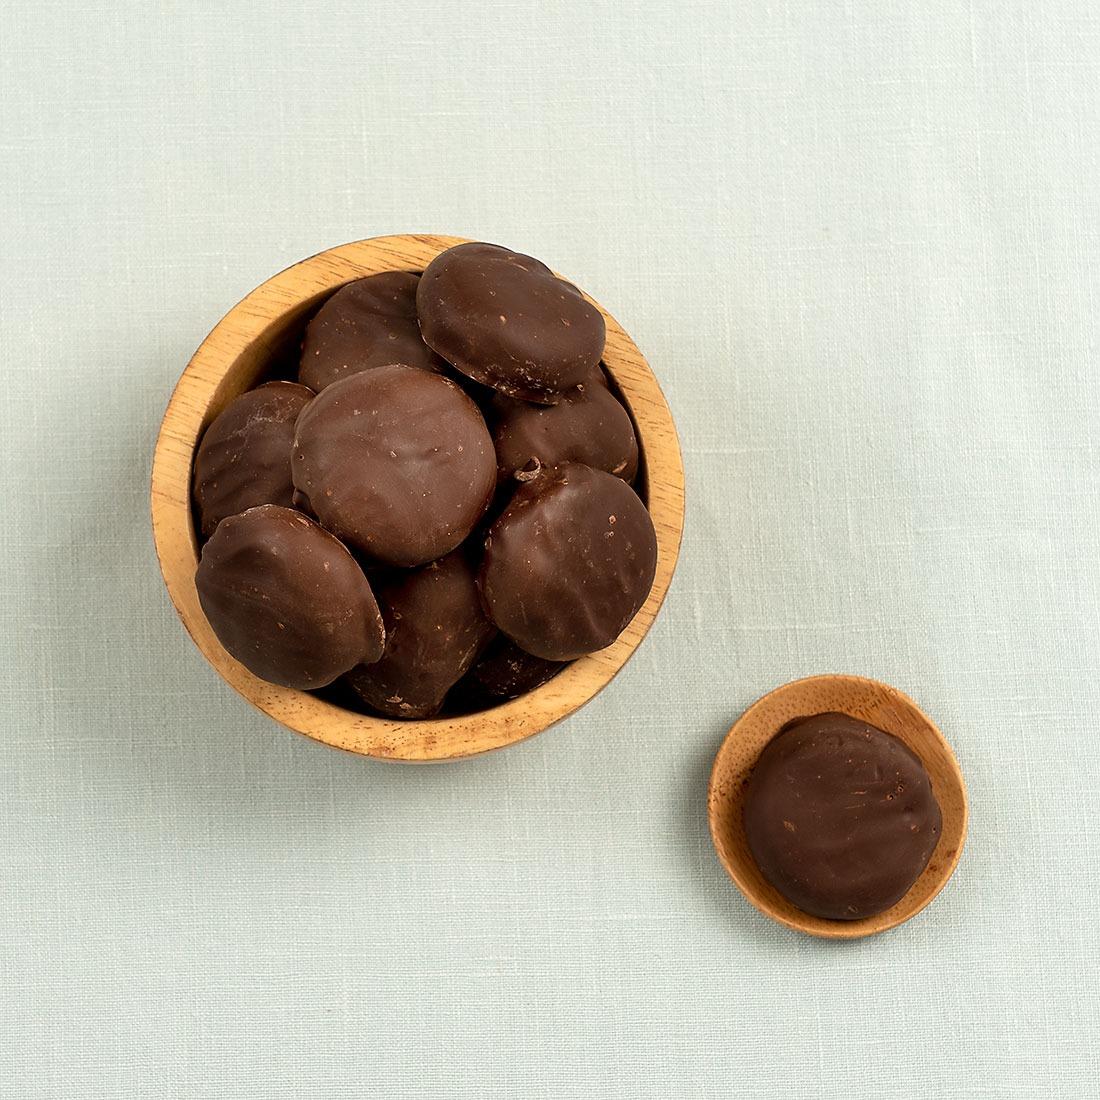 Dadel chocolade kokos bites